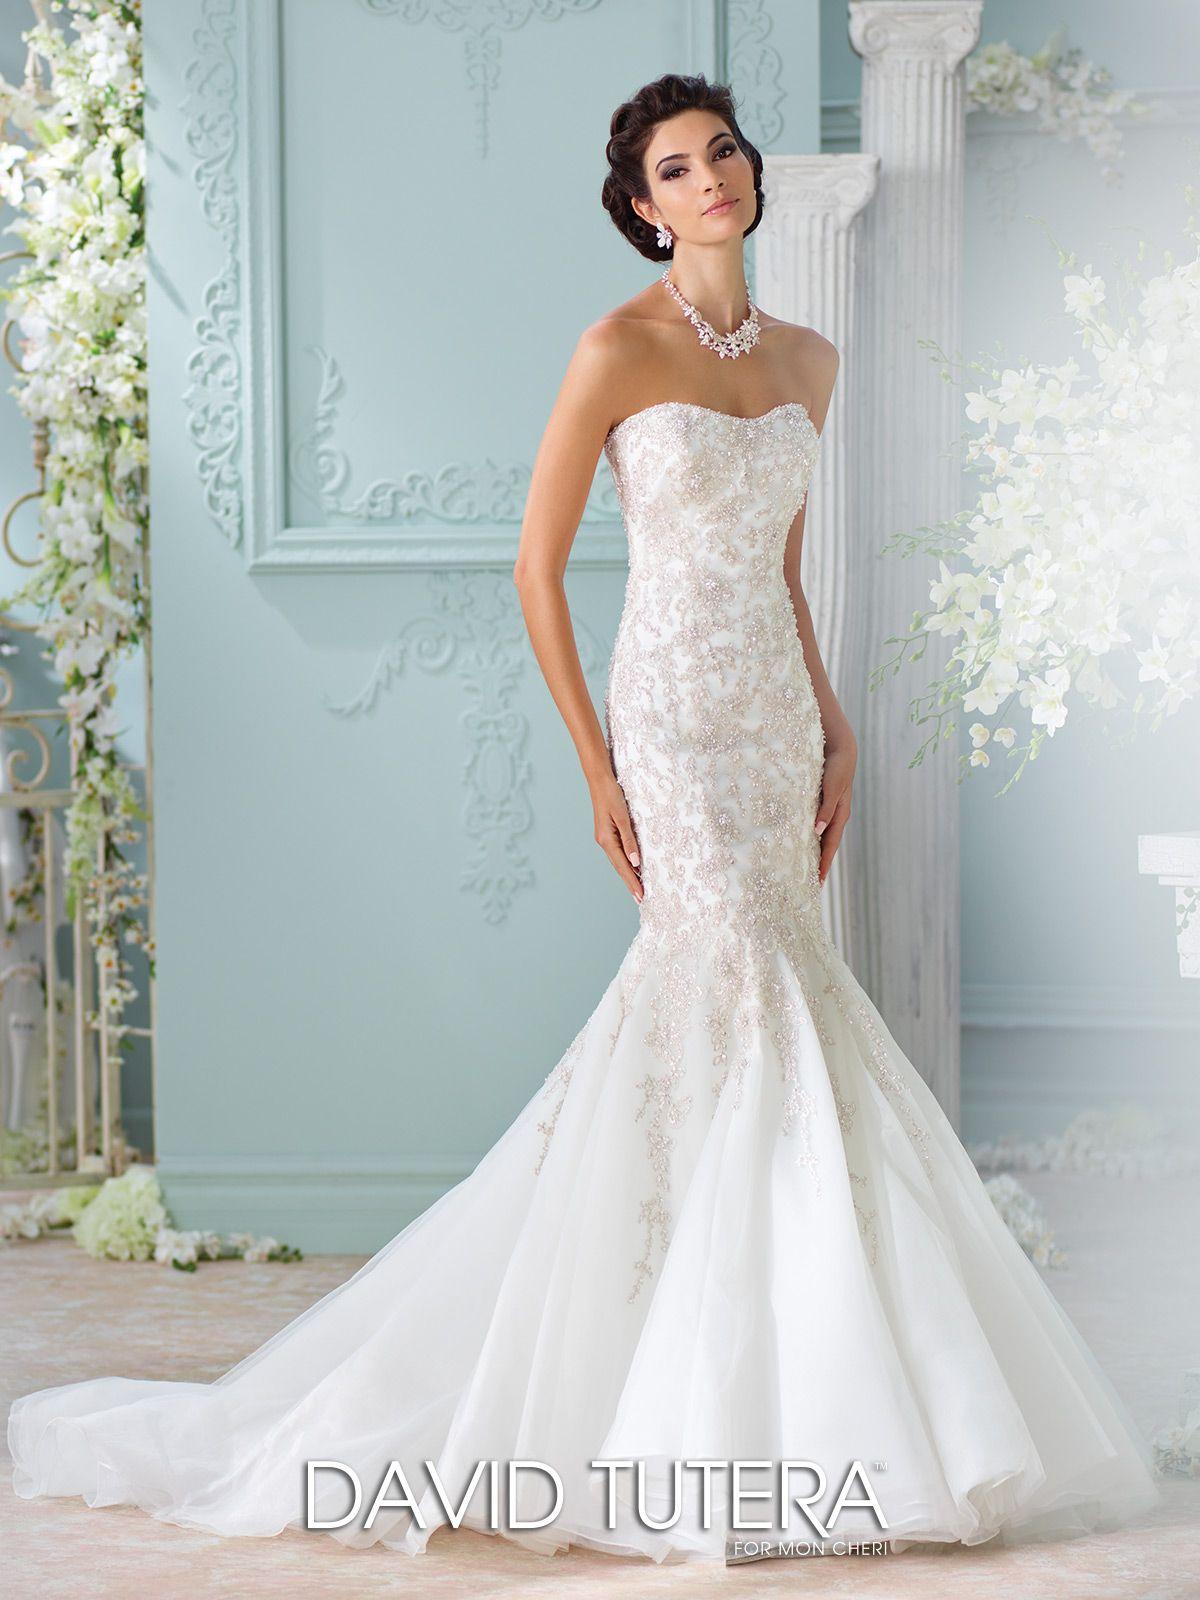 Dorable Bridal Gowns Delaware Pattern - All Wedding Dresses ...